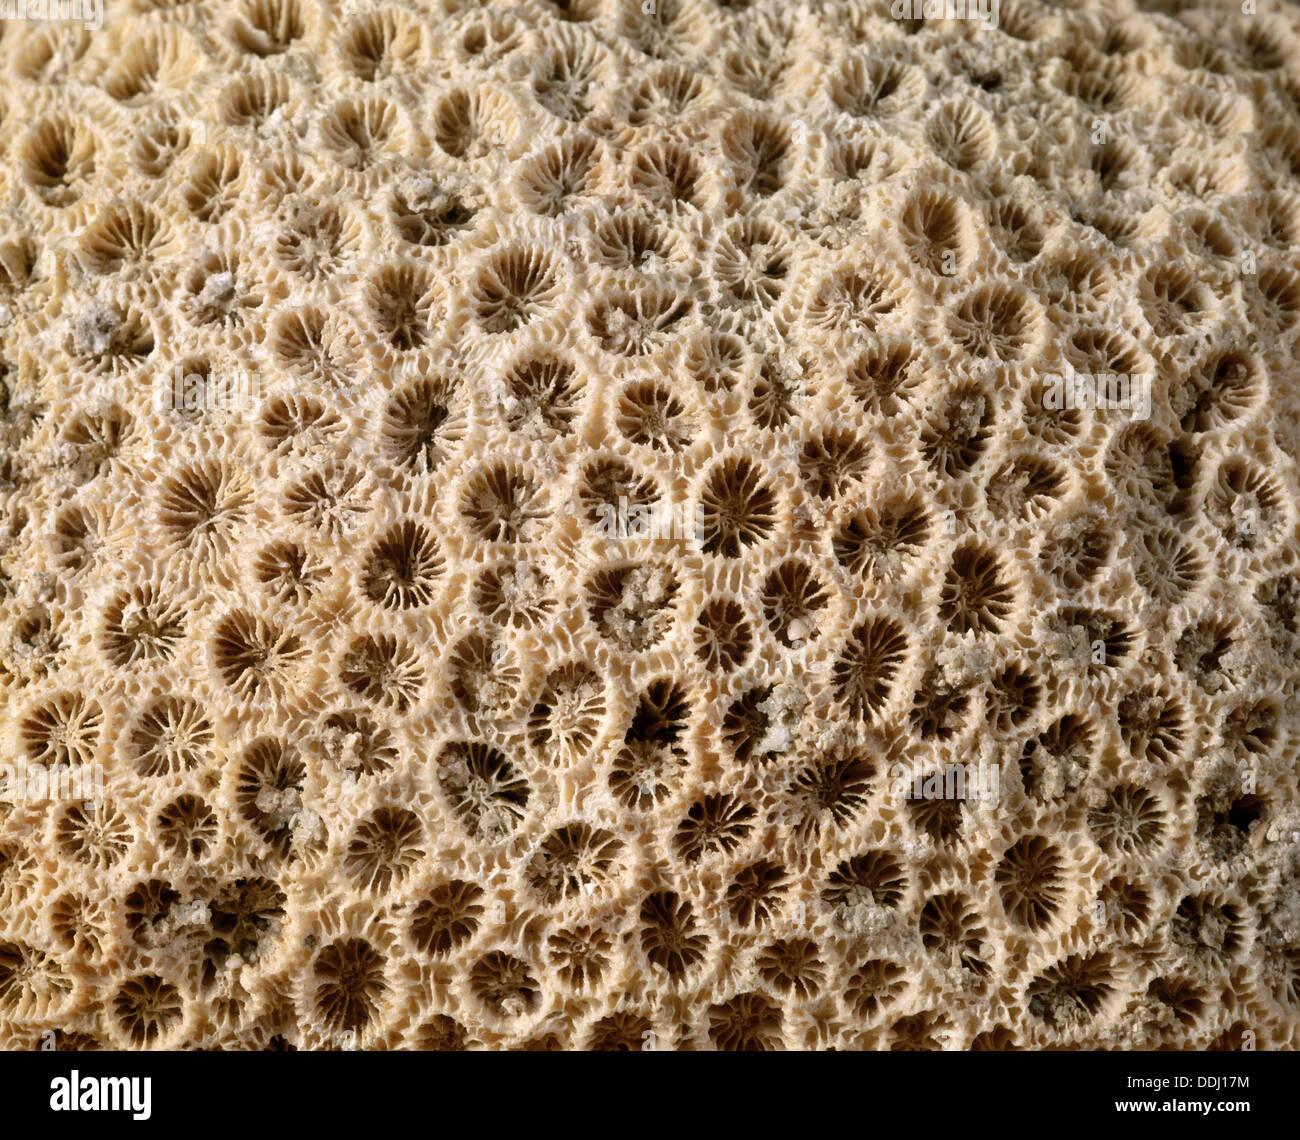 Anthozoa fossil.  Orbicella. Pliocene. Diameter: Polypus 9 mm. Marsa Alam. Egypt. - Stock Image